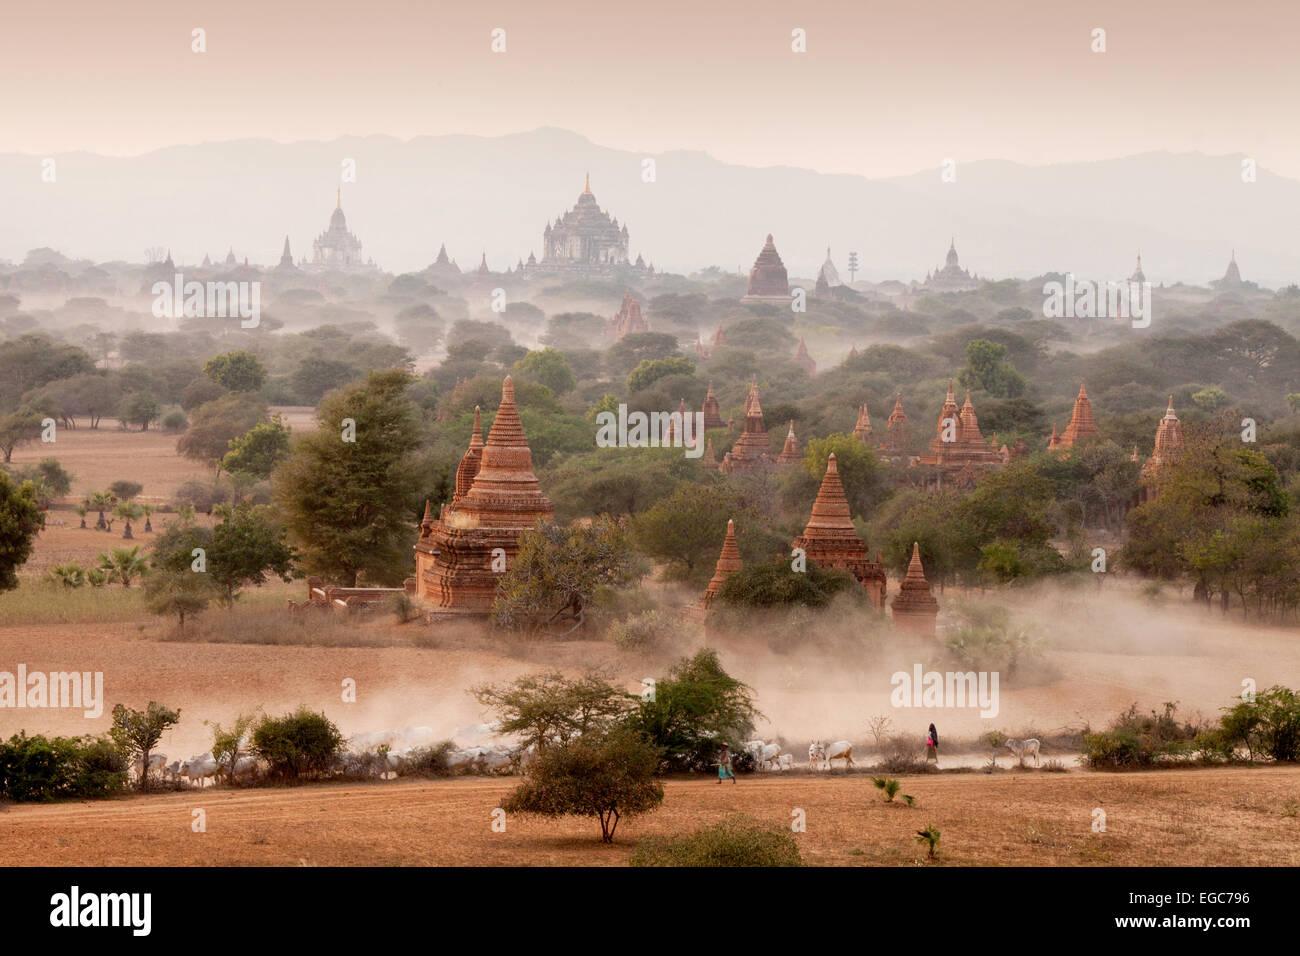 A farmer herding cows among the temples and pagodas late afternoon, Bagan Plain, Myanmar ( burma ), Asia Stock Photo